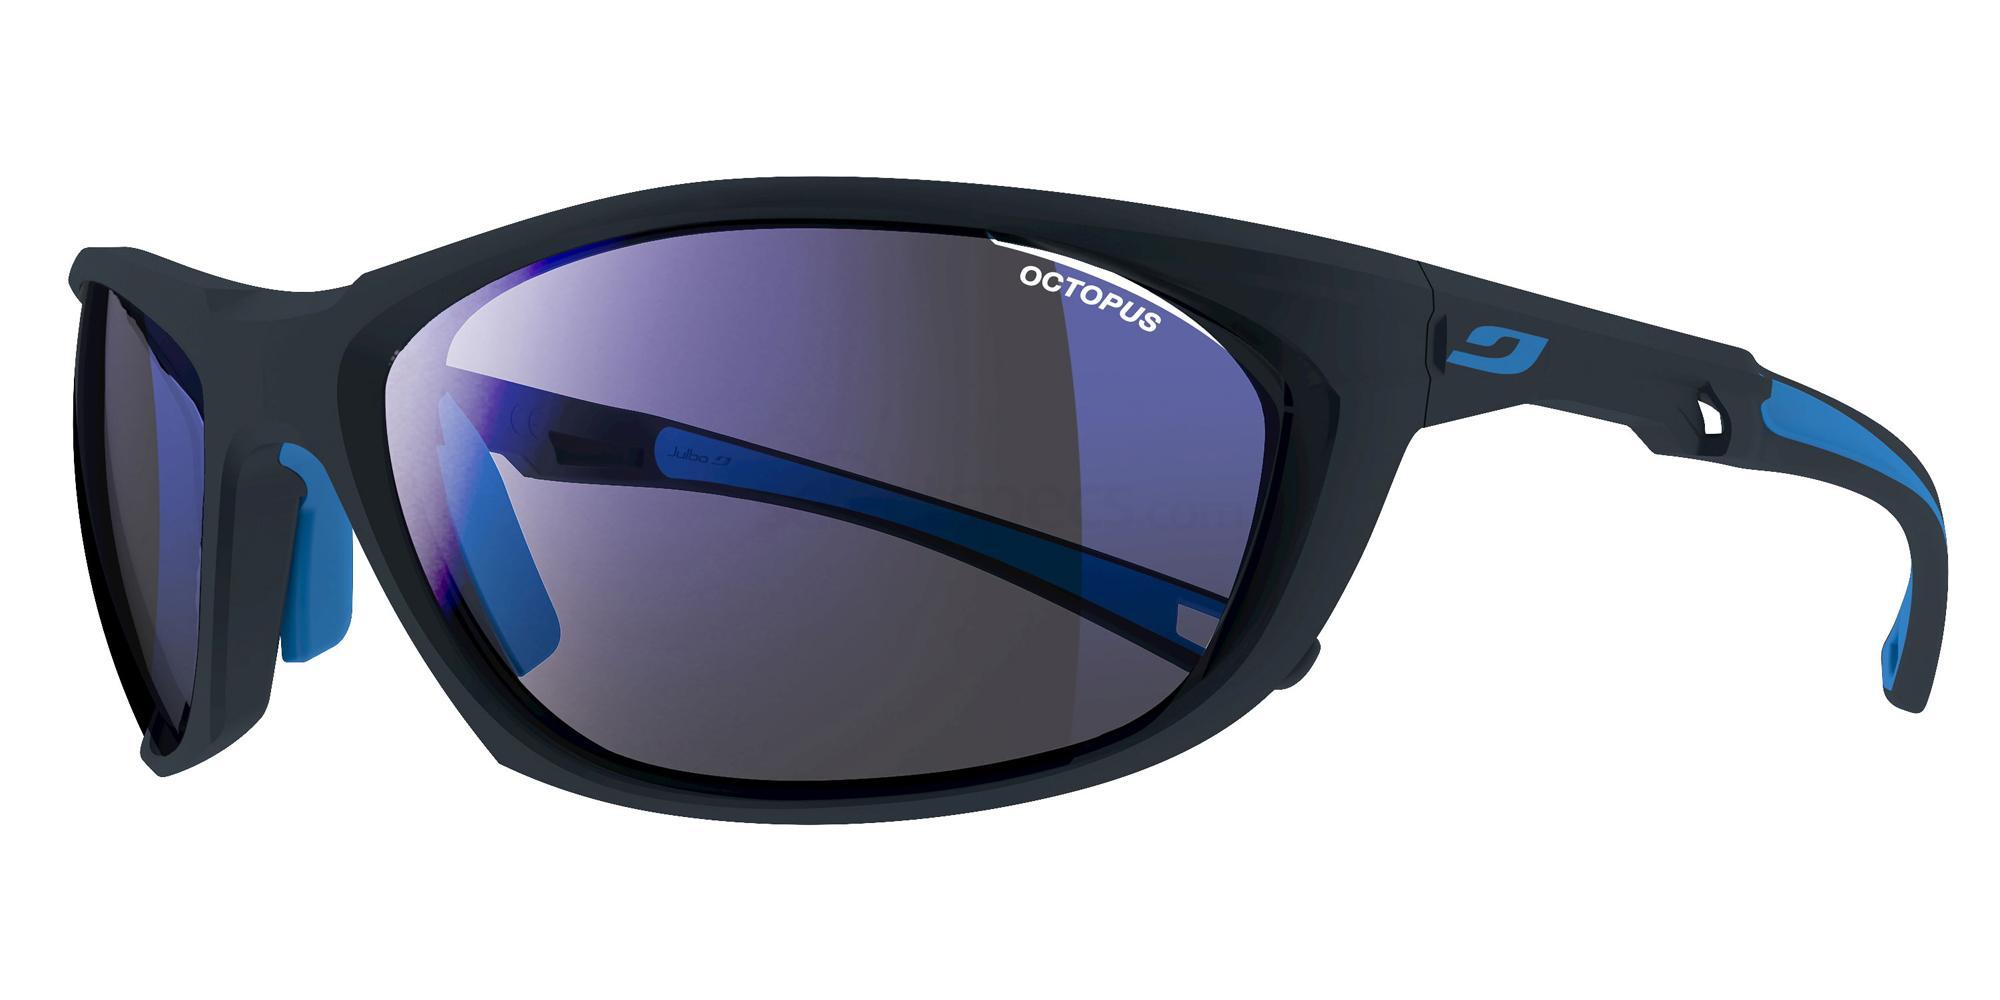 8032 482 RACE 2.0 NAUTIC Sunglasses, Julbo